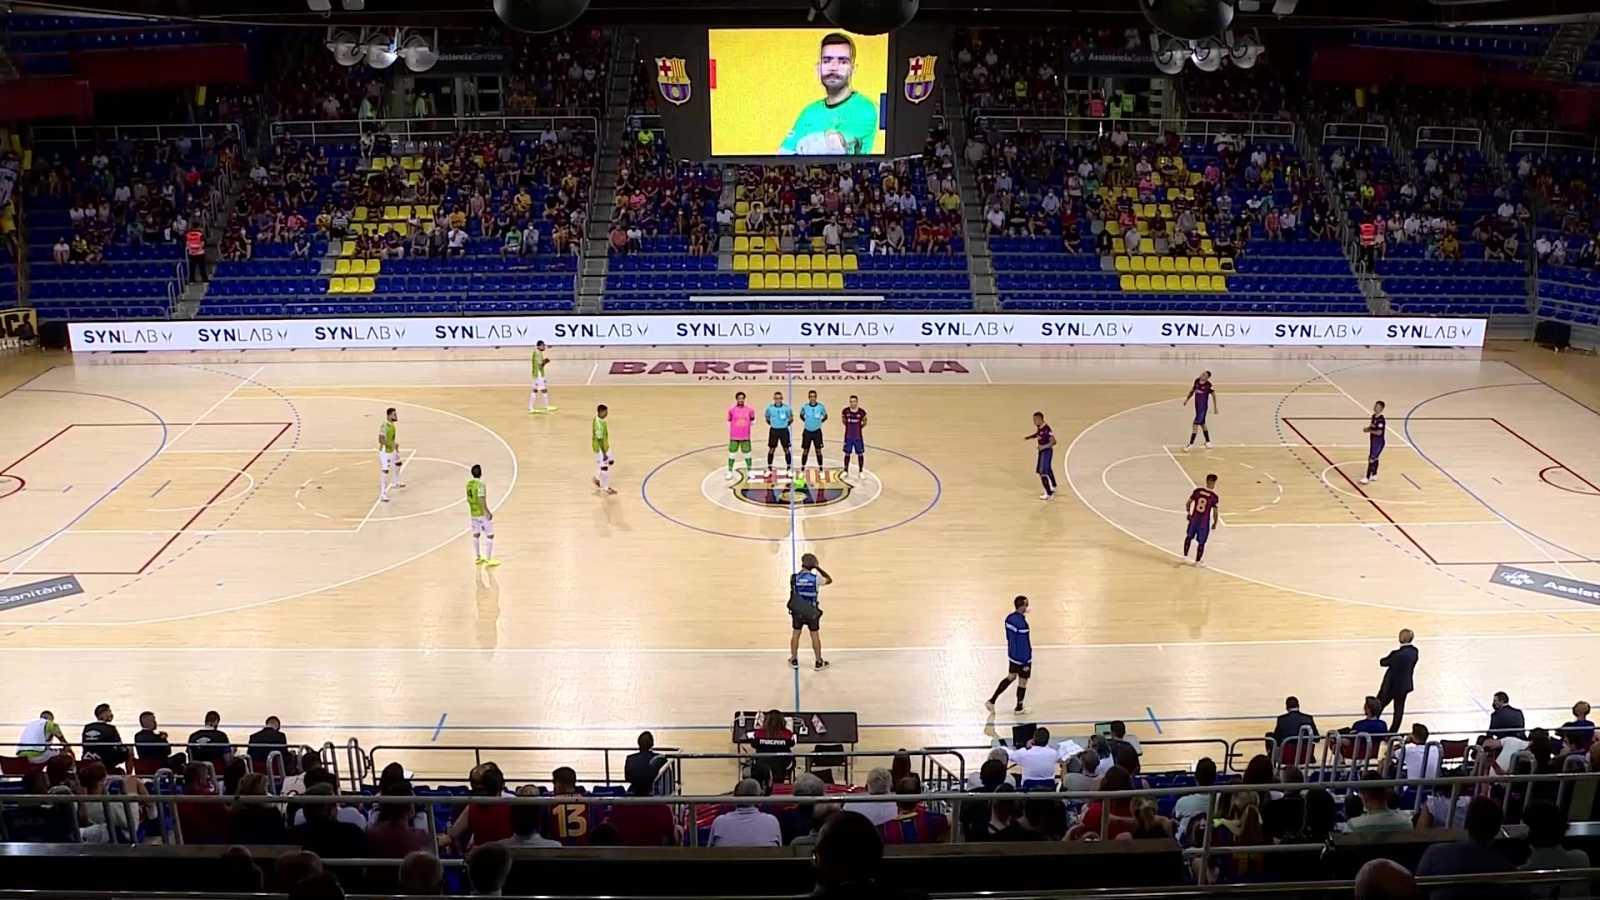 Fútbol Sala - Primera RFEF Futsal. Play off Semifinal. 2º Partido: Barça - Palma Futsal - ver ahora